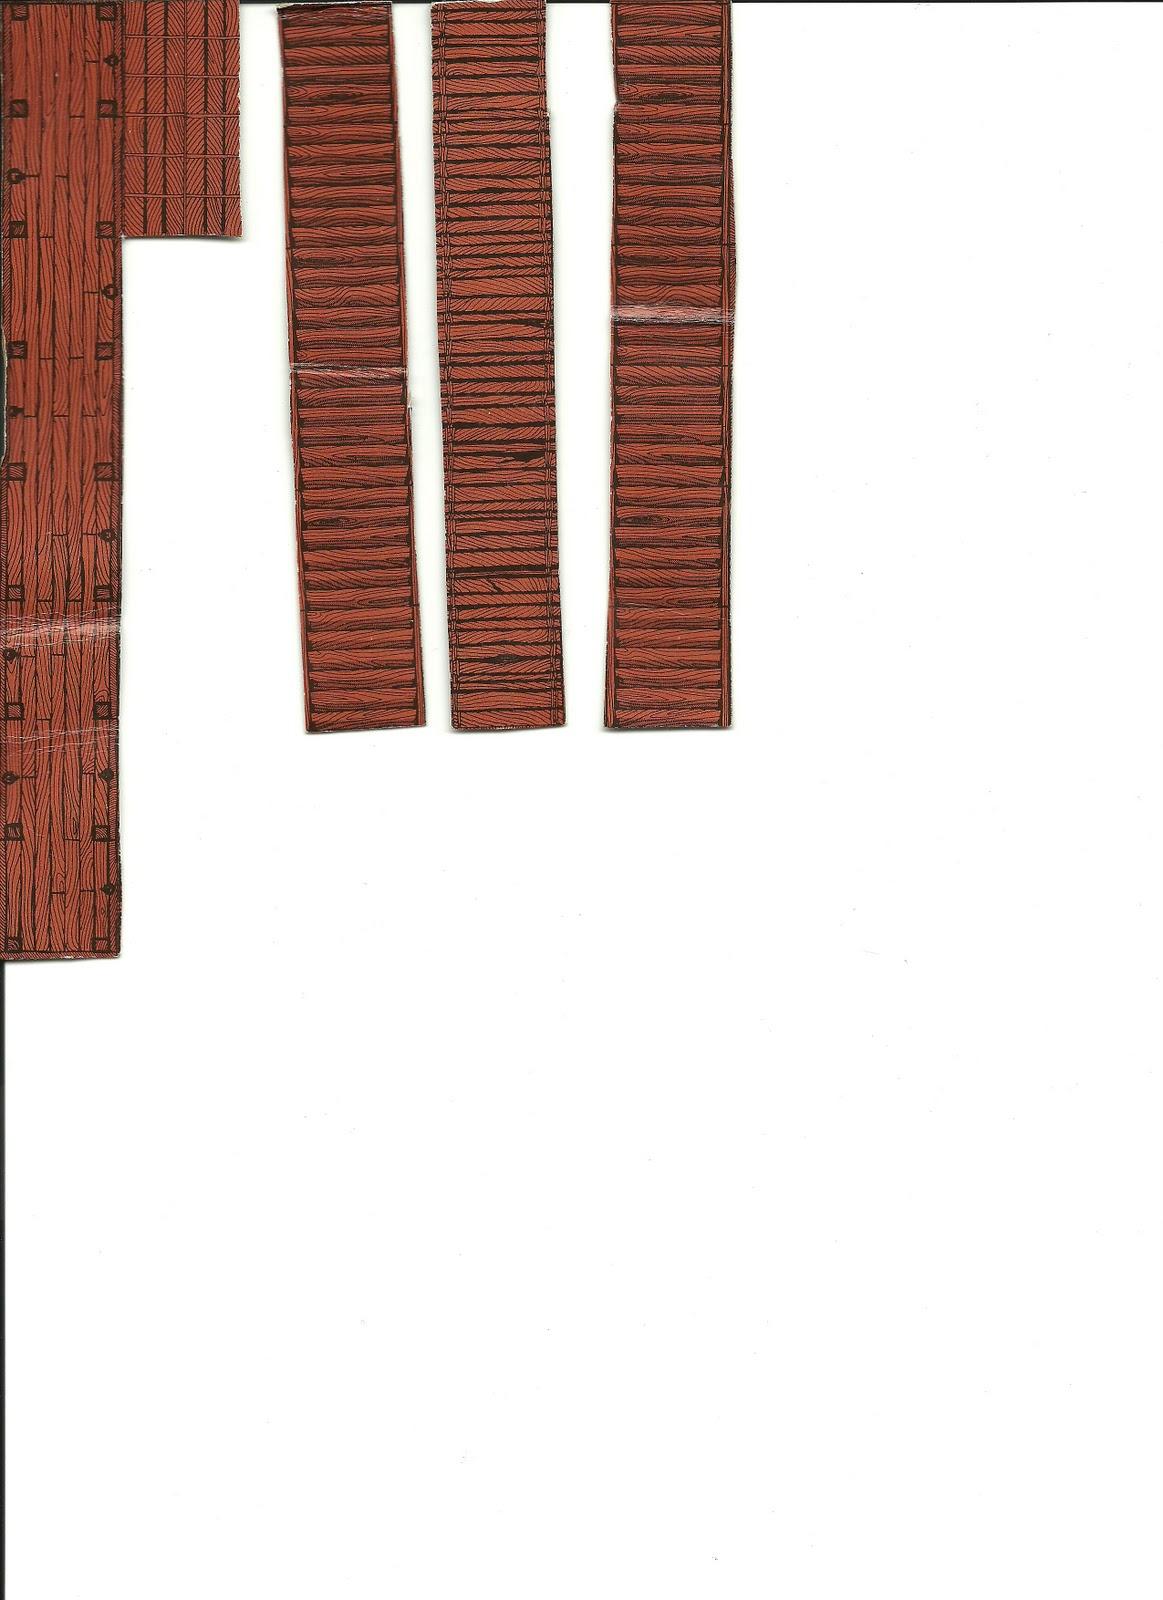 davids rpg dungeon floor plans rpg home plans ideas picture davids rpg dungeon floor plans rpg home plans ideas picture